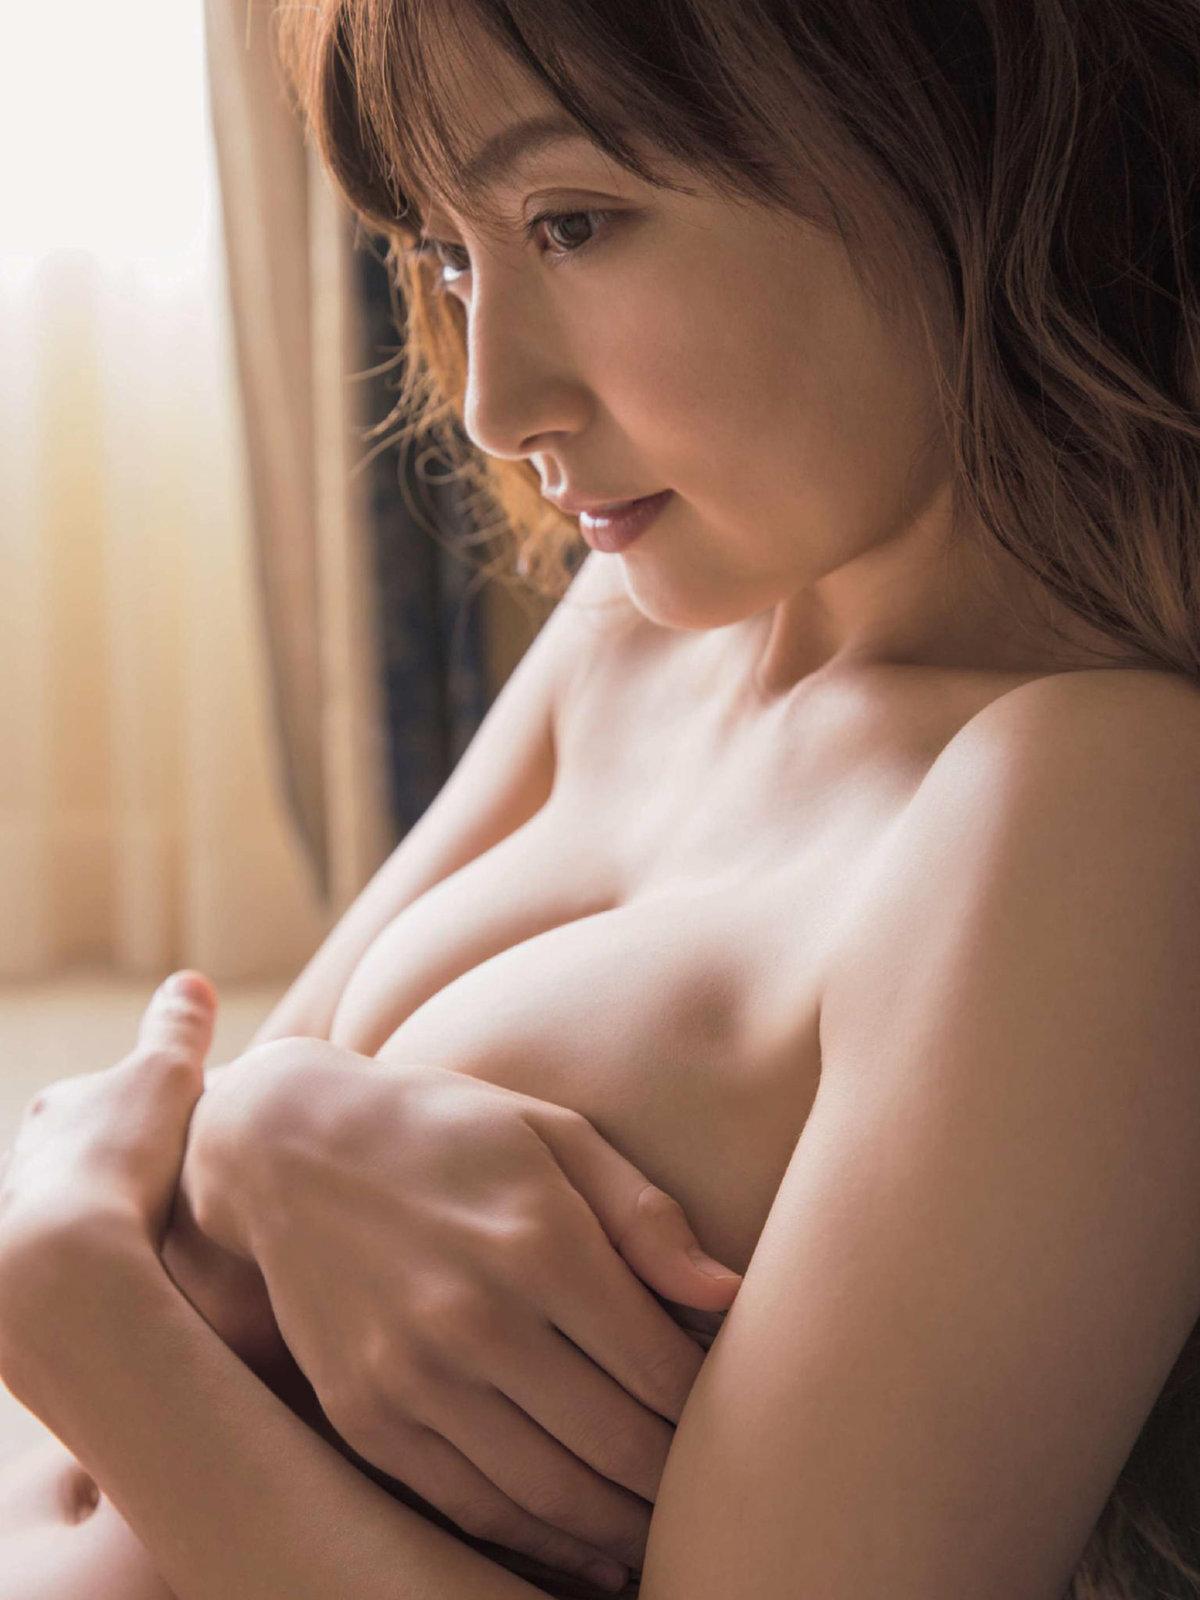 Yoko Kumada 熊田曜子, Shukan Gendai 2017.06.17 (週刊現代 2017年06月17日号)